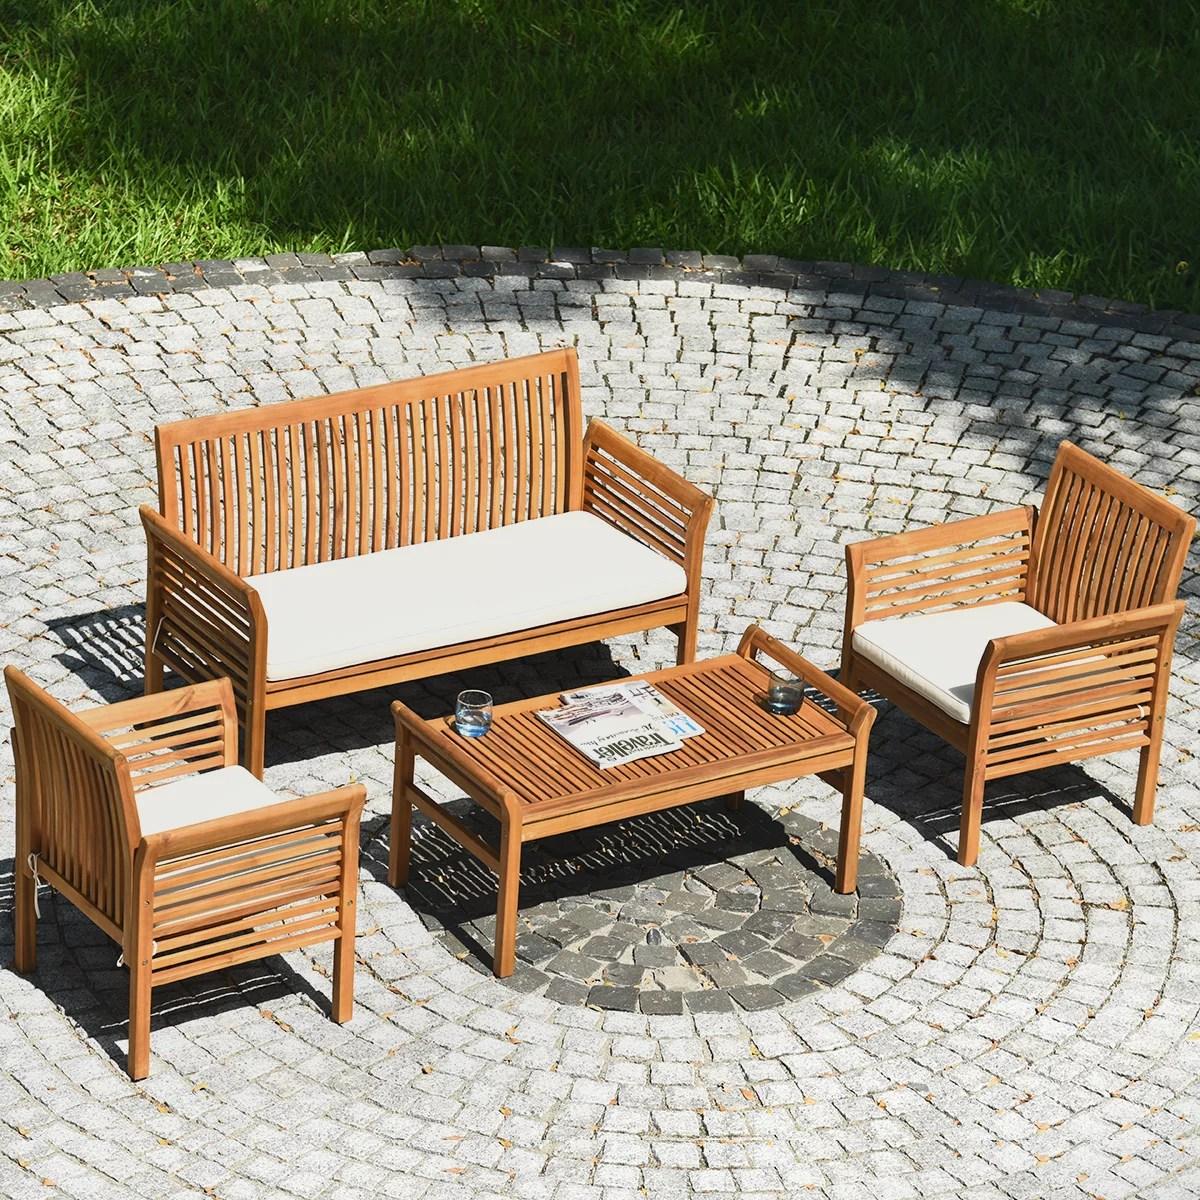 gymax 4pcs wooden patio conversation set outdoor furniture set w cushion